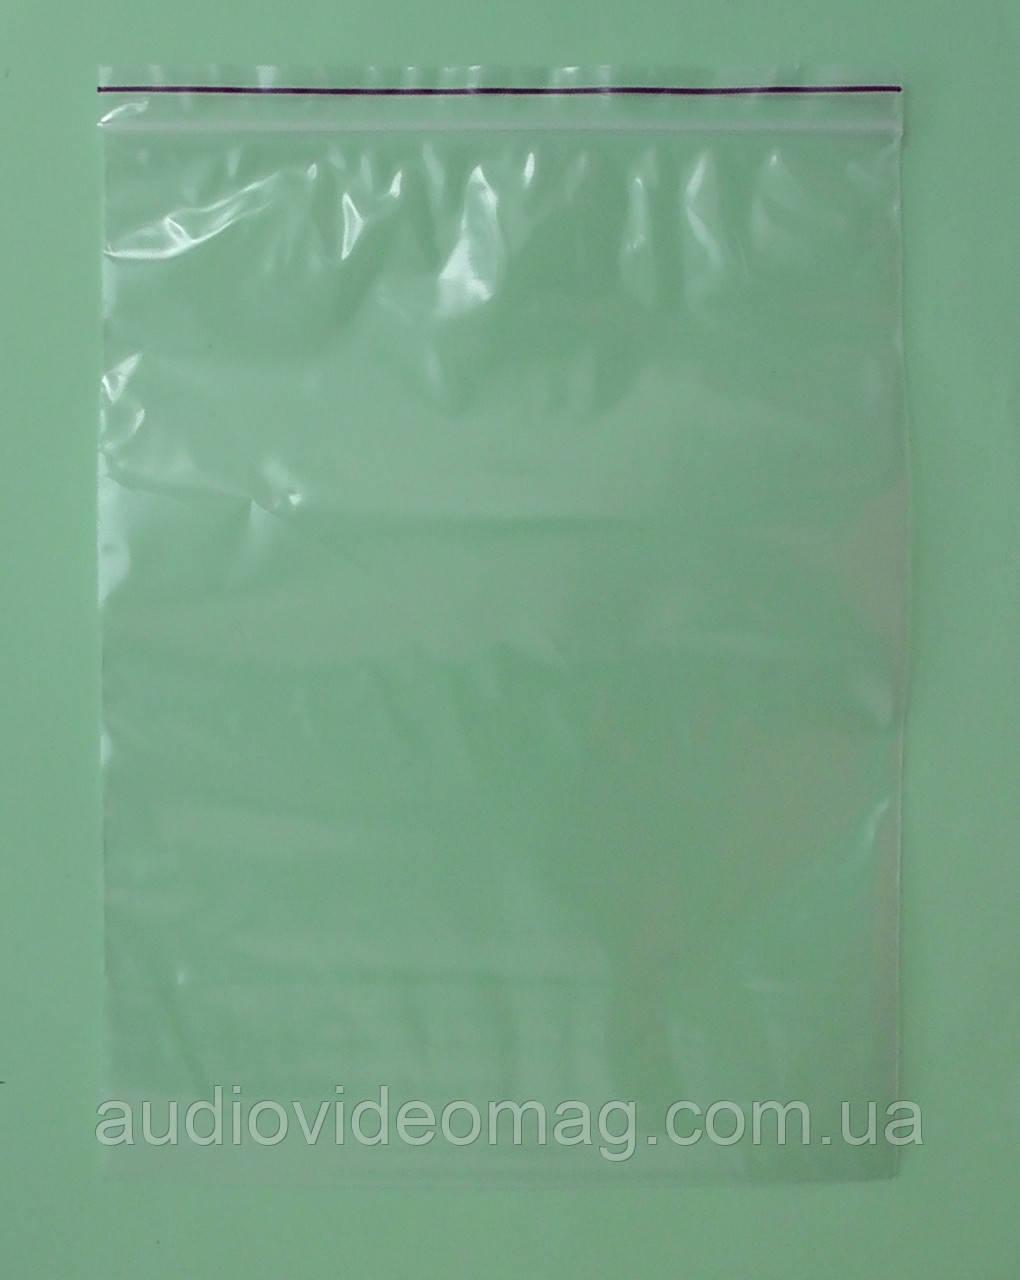 Зип-пакет со струнным замком Zip-lock, размер 15 х 20 см., упаковка 100 шт.